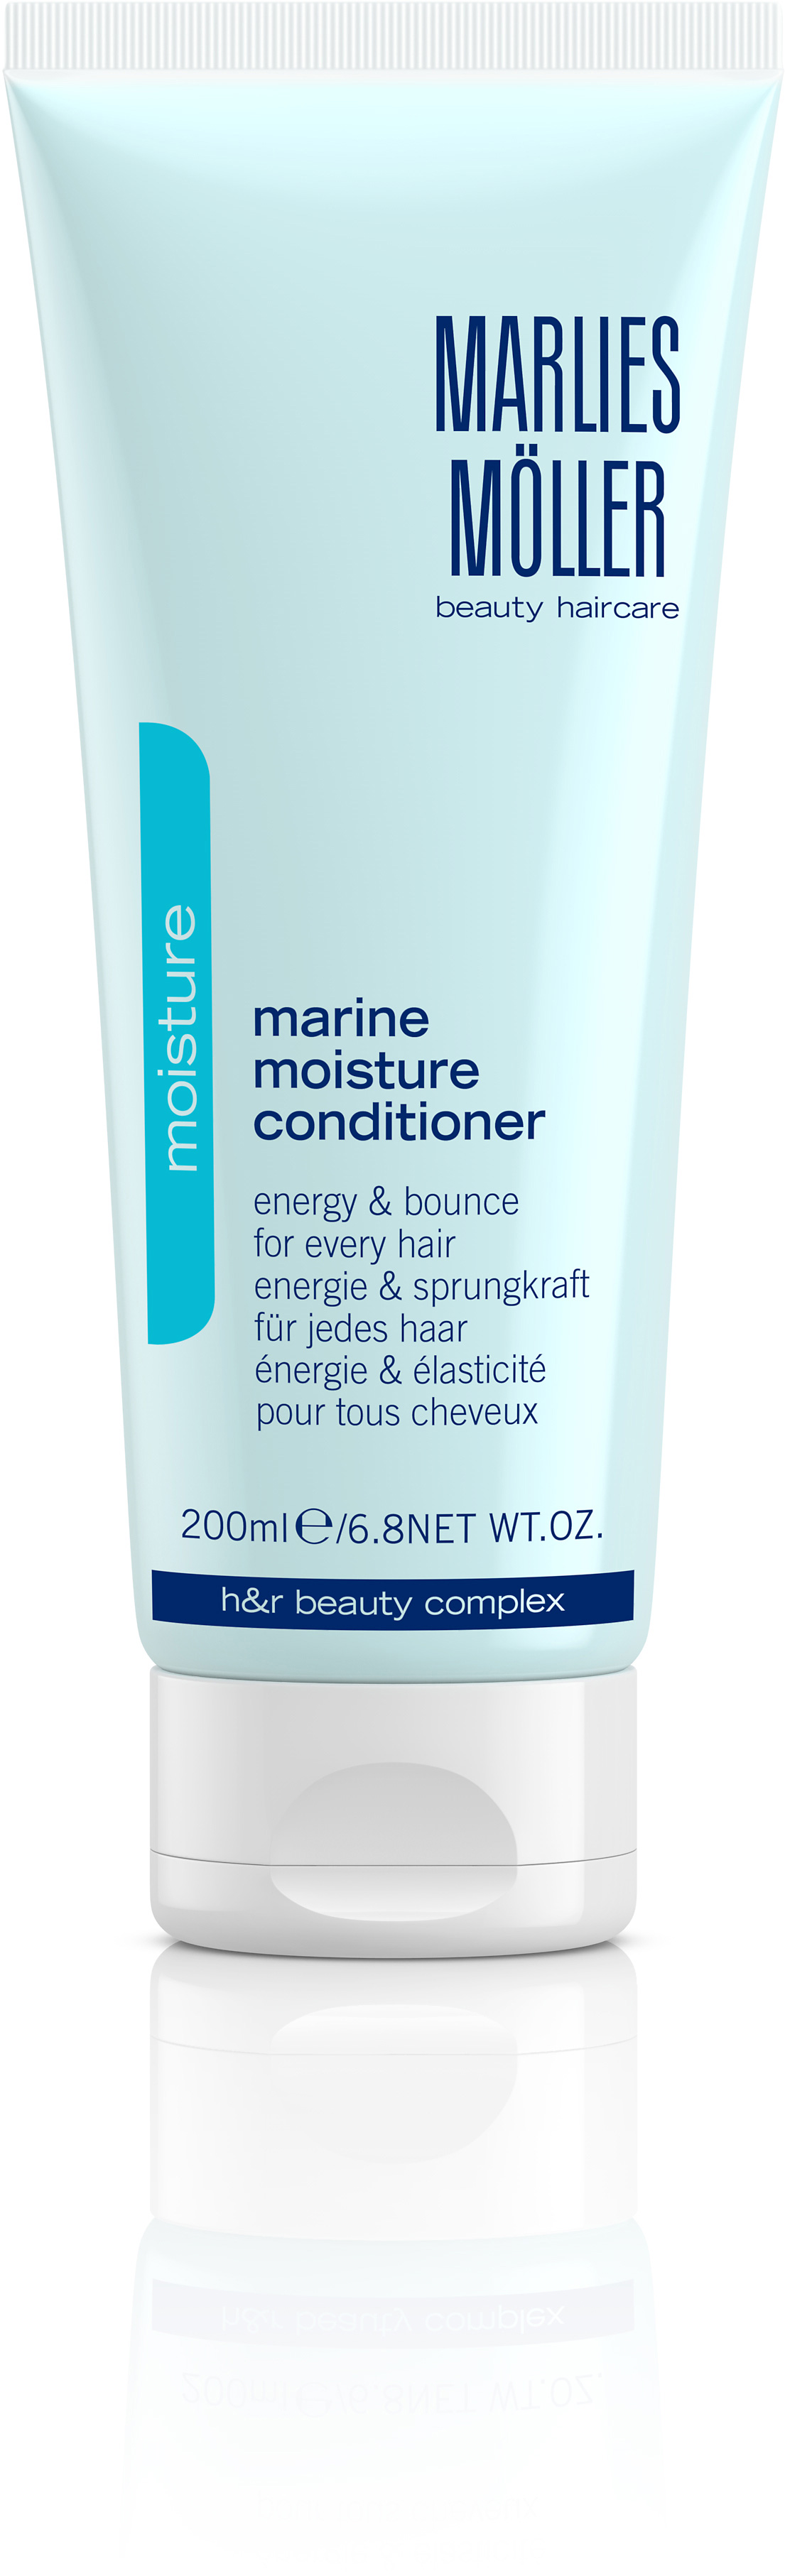 Marlies Möller Clean Moist Marine Condit 200 ml